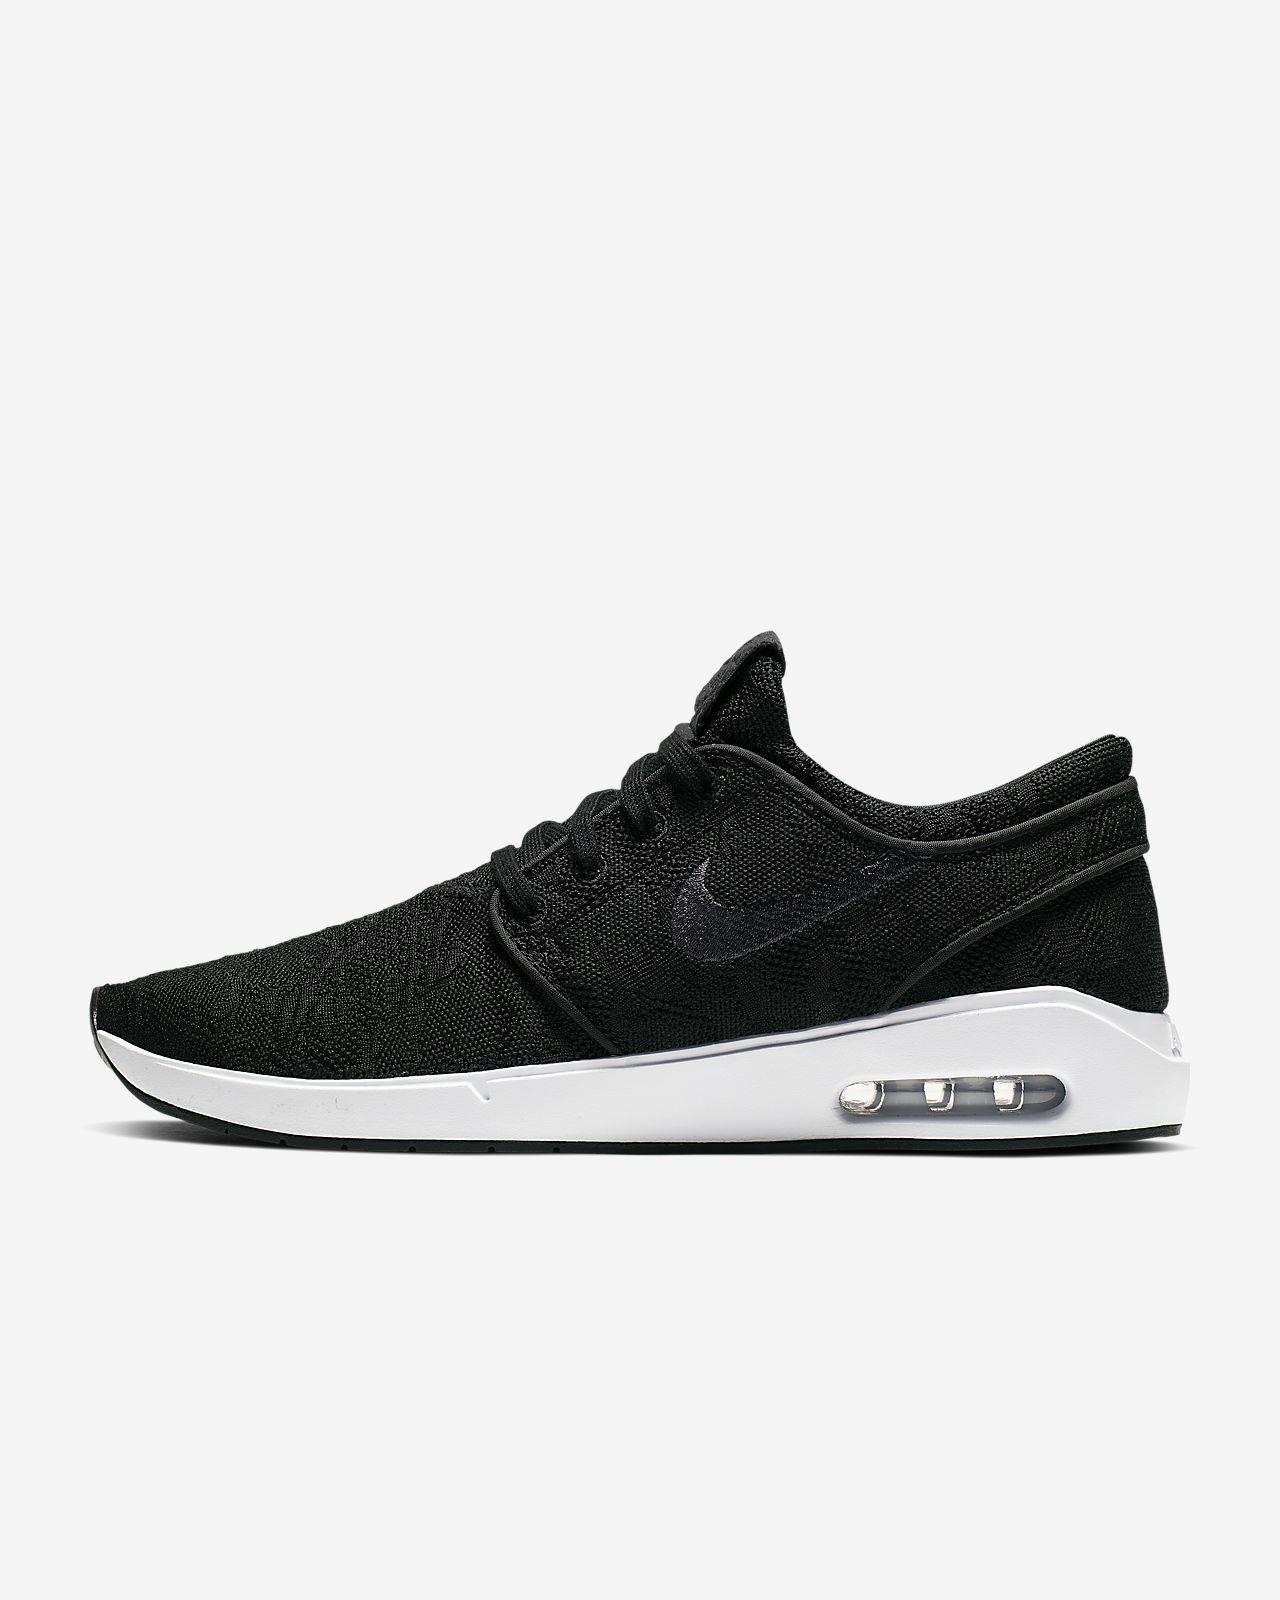 Nike air max stefan janoski noir et blanc